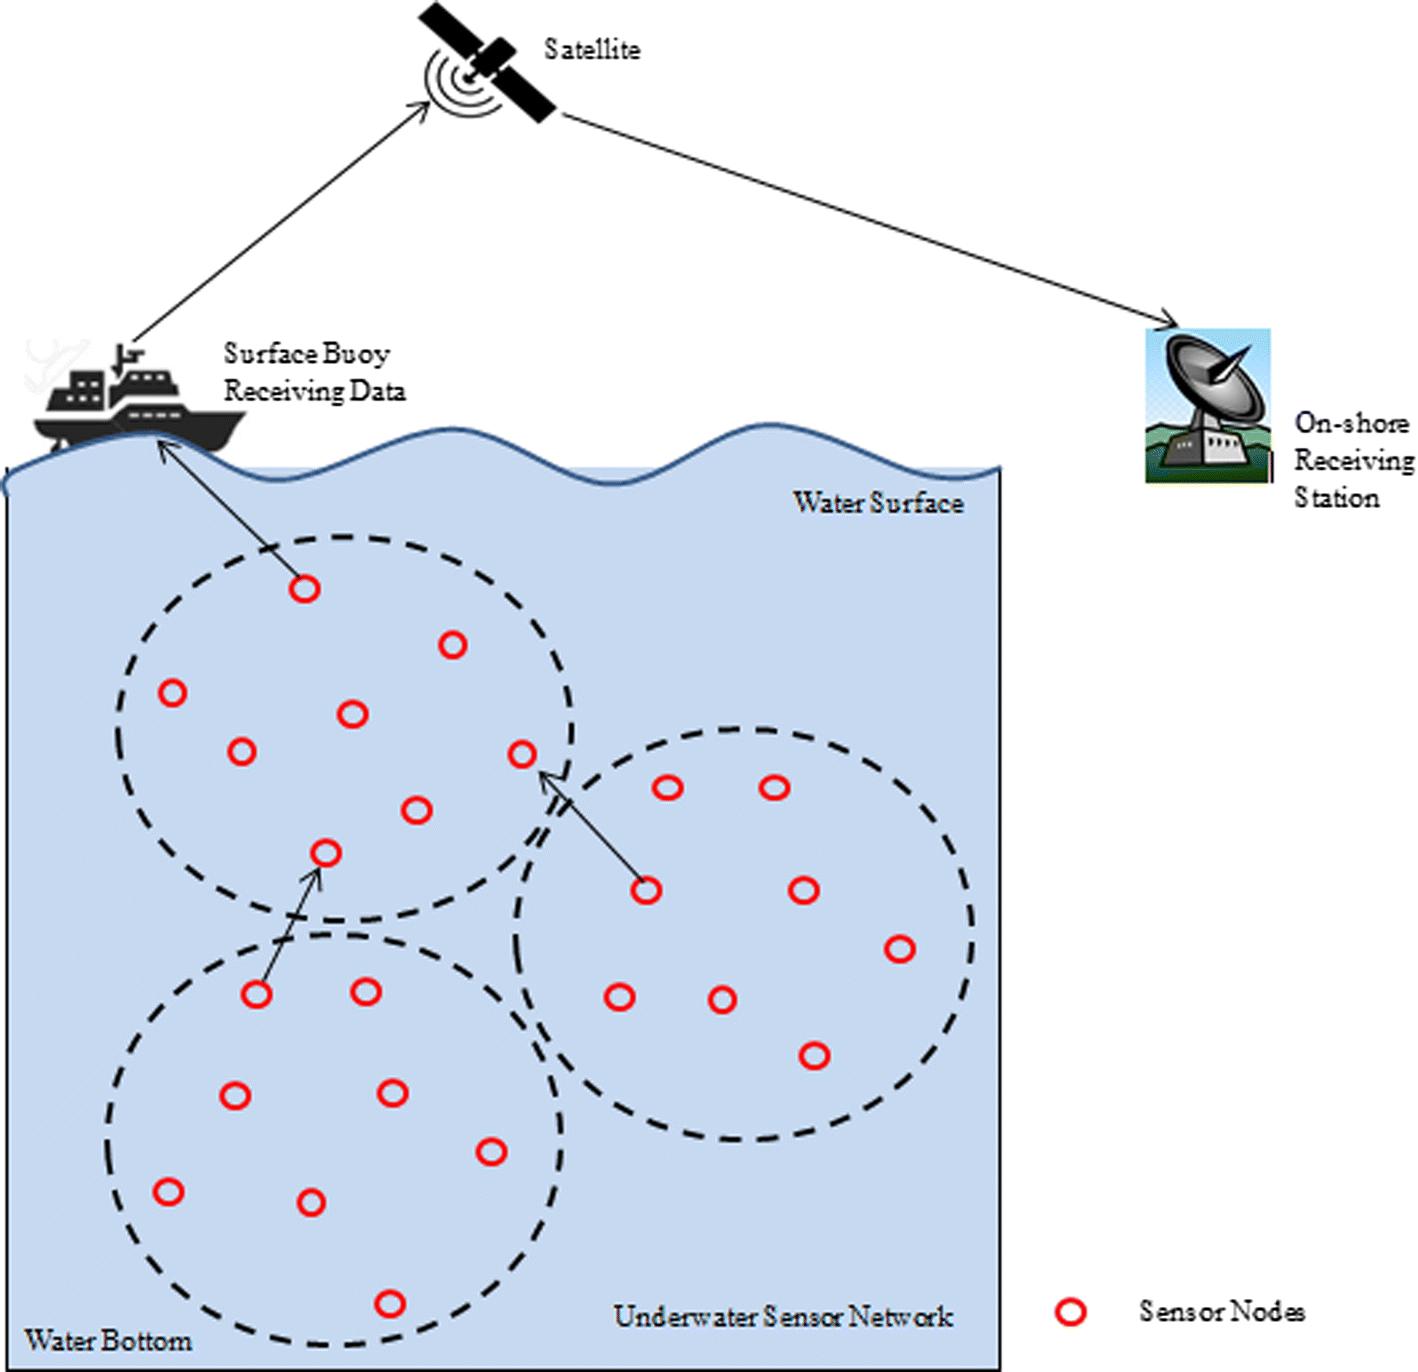 Protocol Stack Of Underwater Wireless Sensor Network Classical 1991 Explorer Wiring Diagram Auto Zone Open Image In New Window